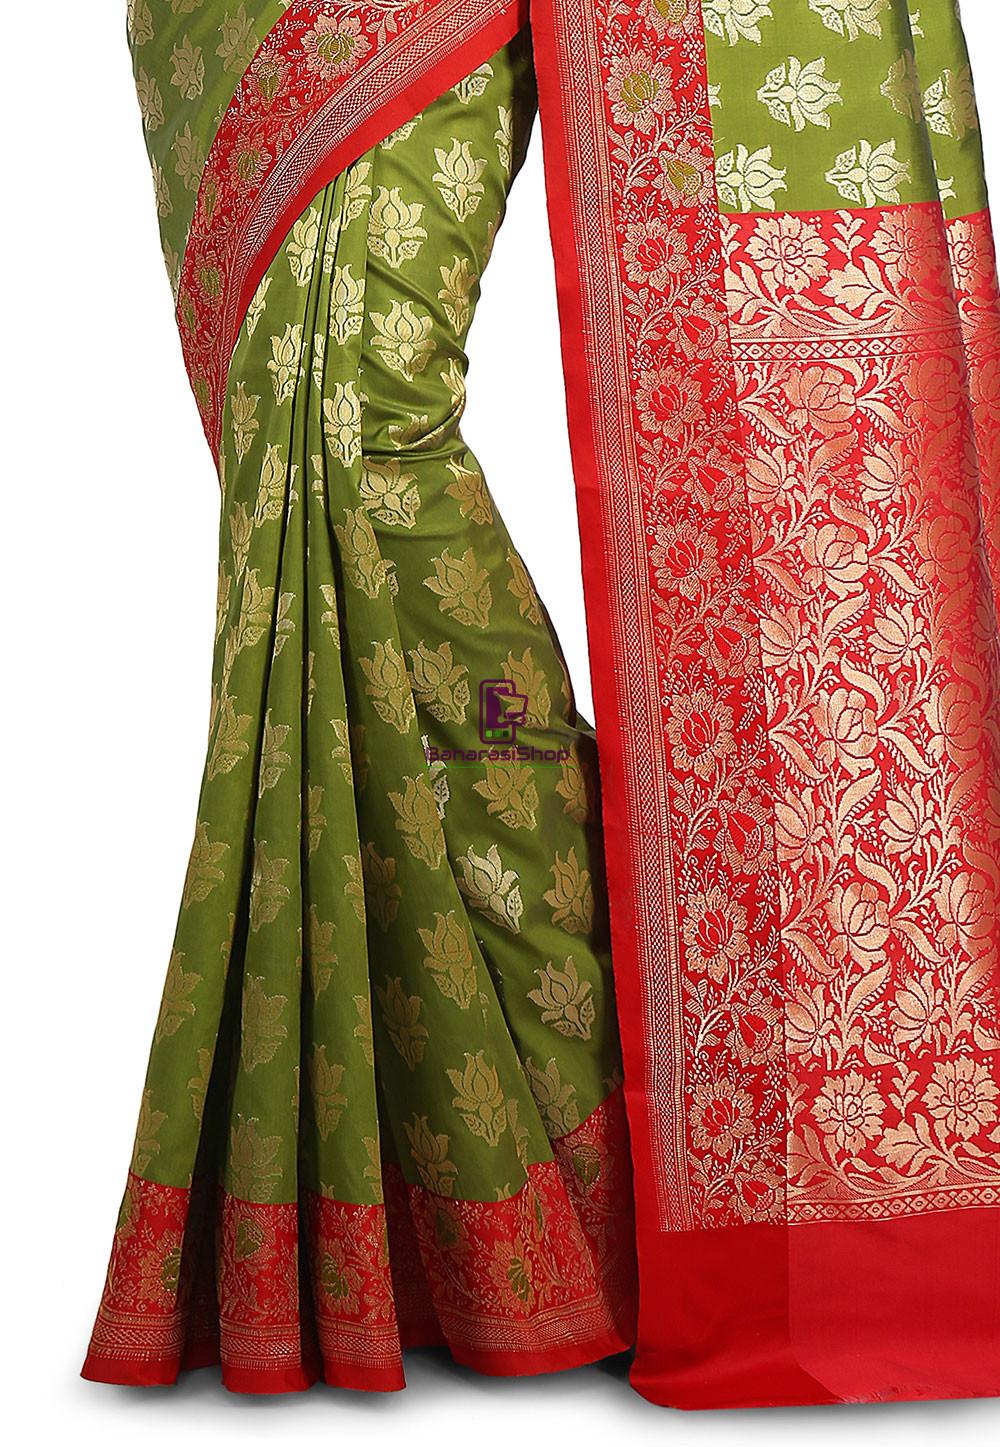 Woven Banarasi Art Silk Saree in Olive Green and Red 2